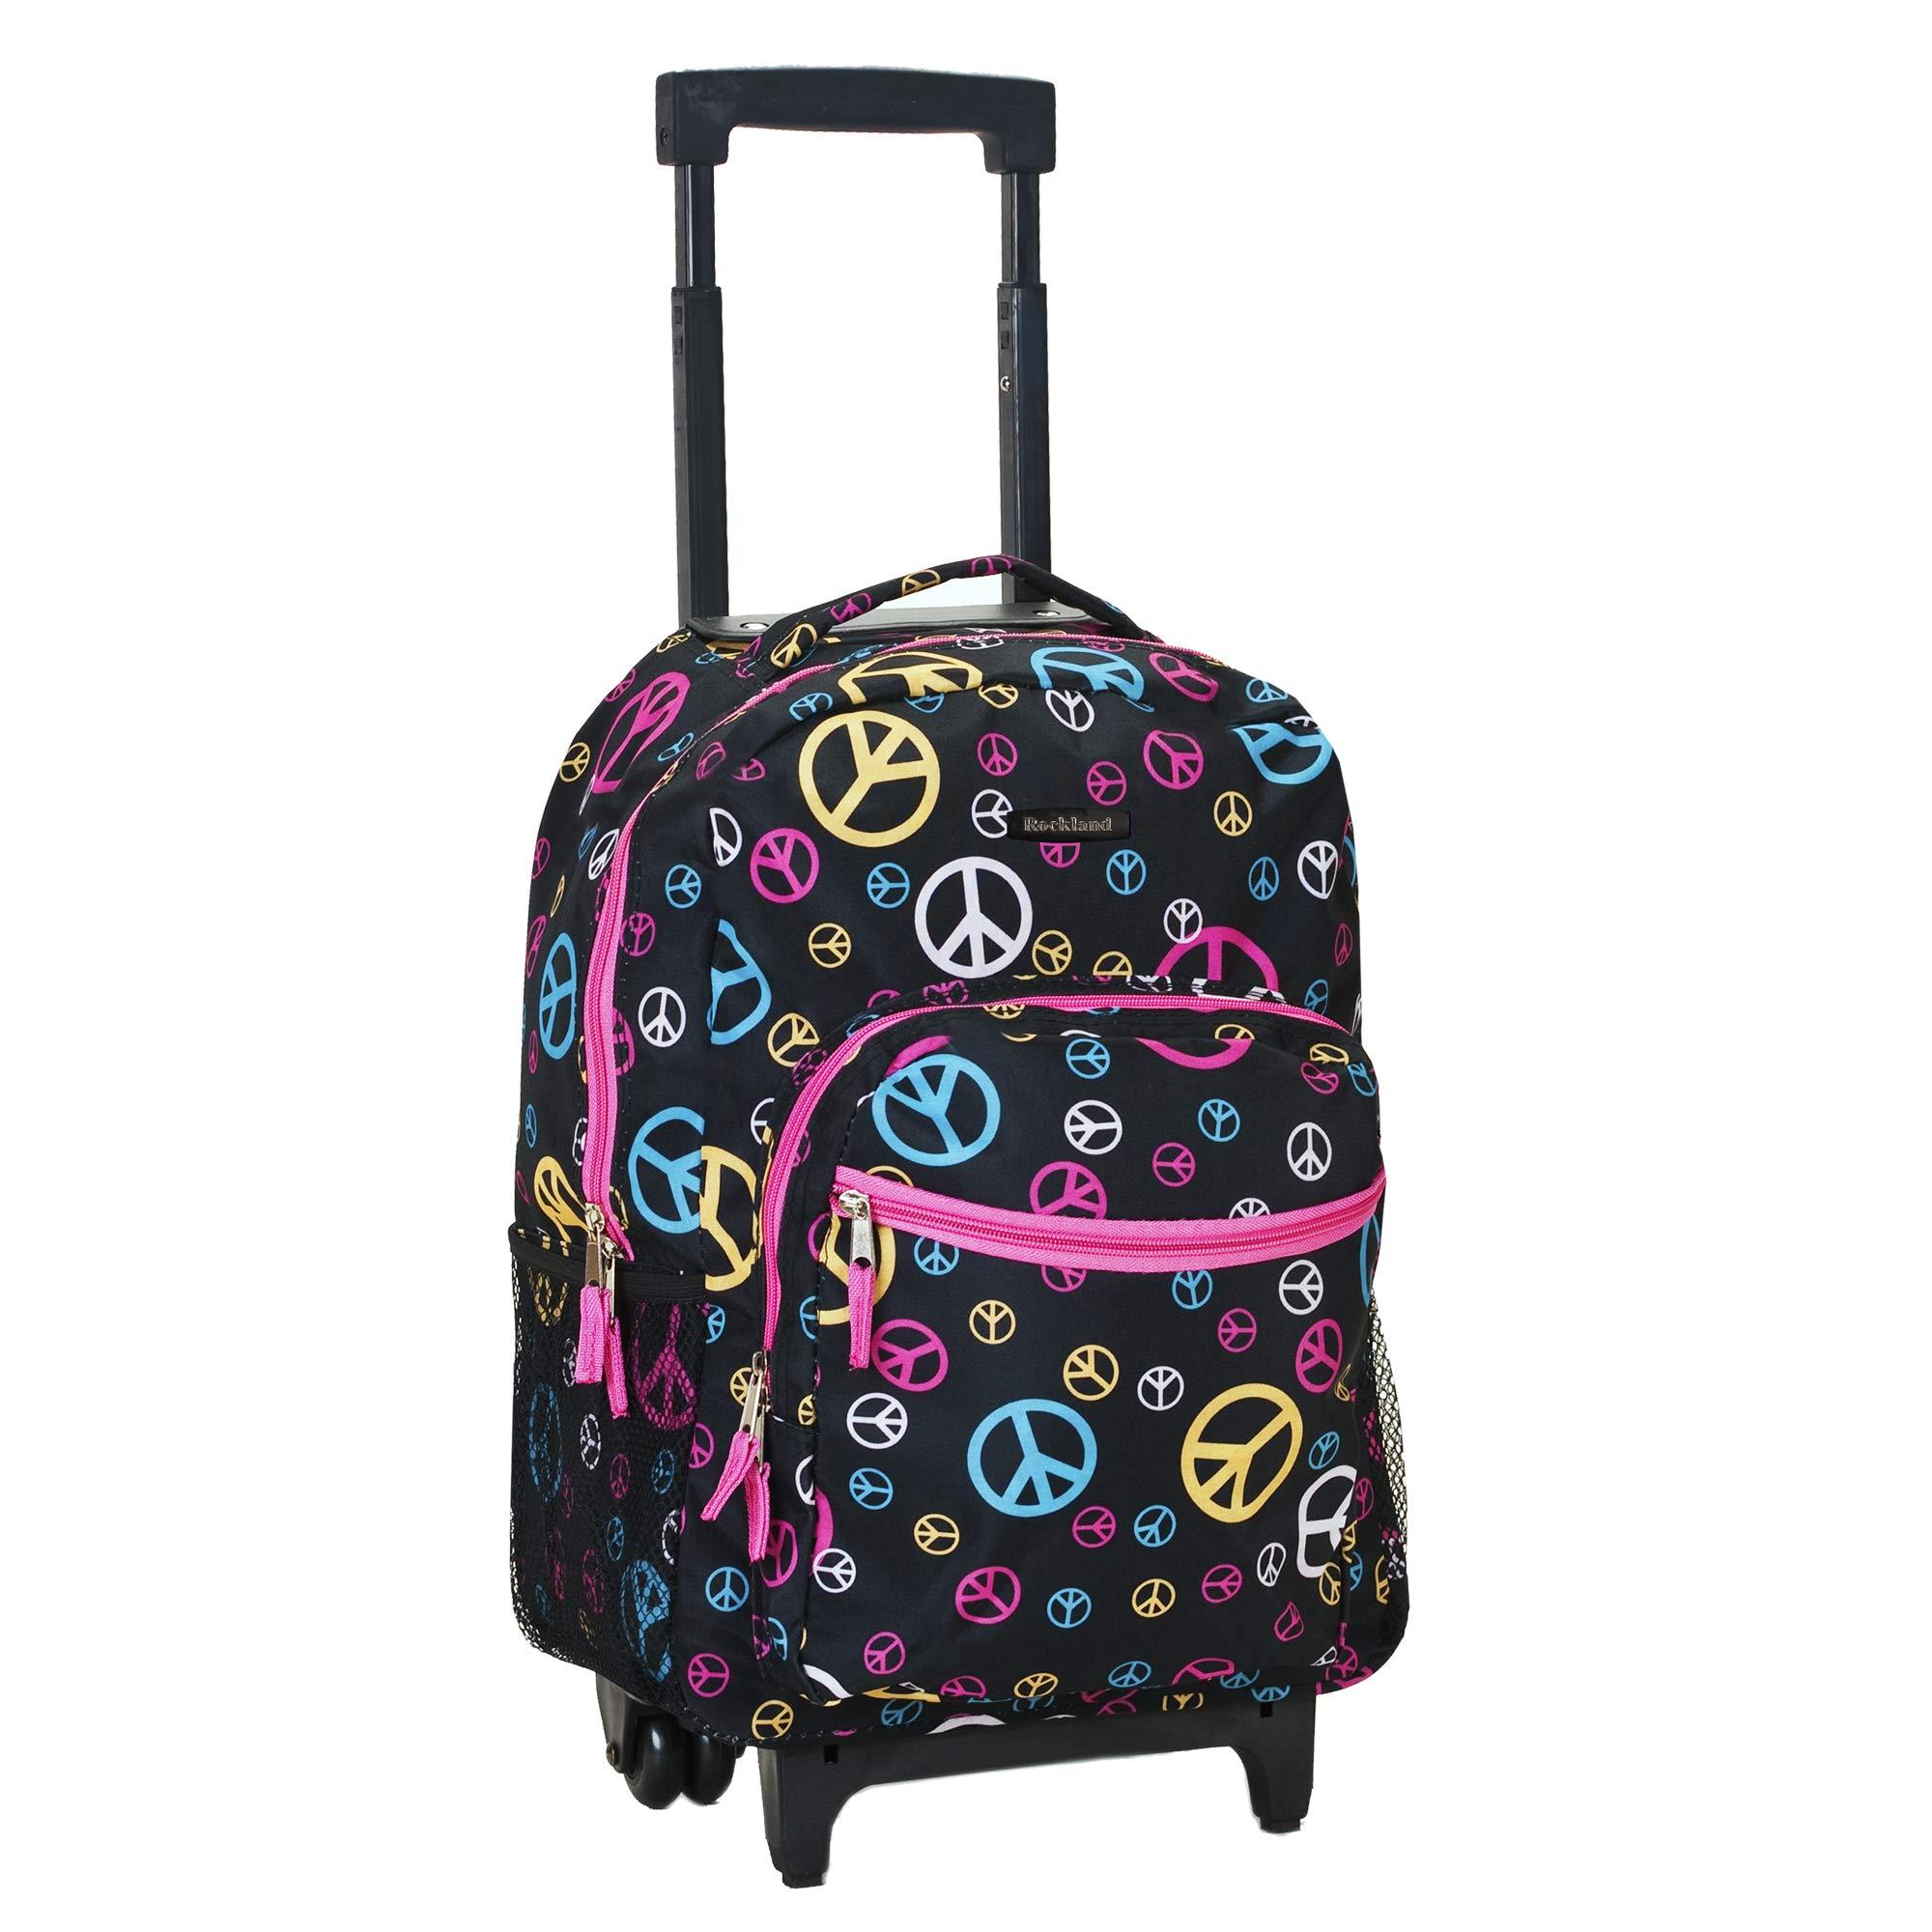 Rockland Luggage Rolling Backpack Medium